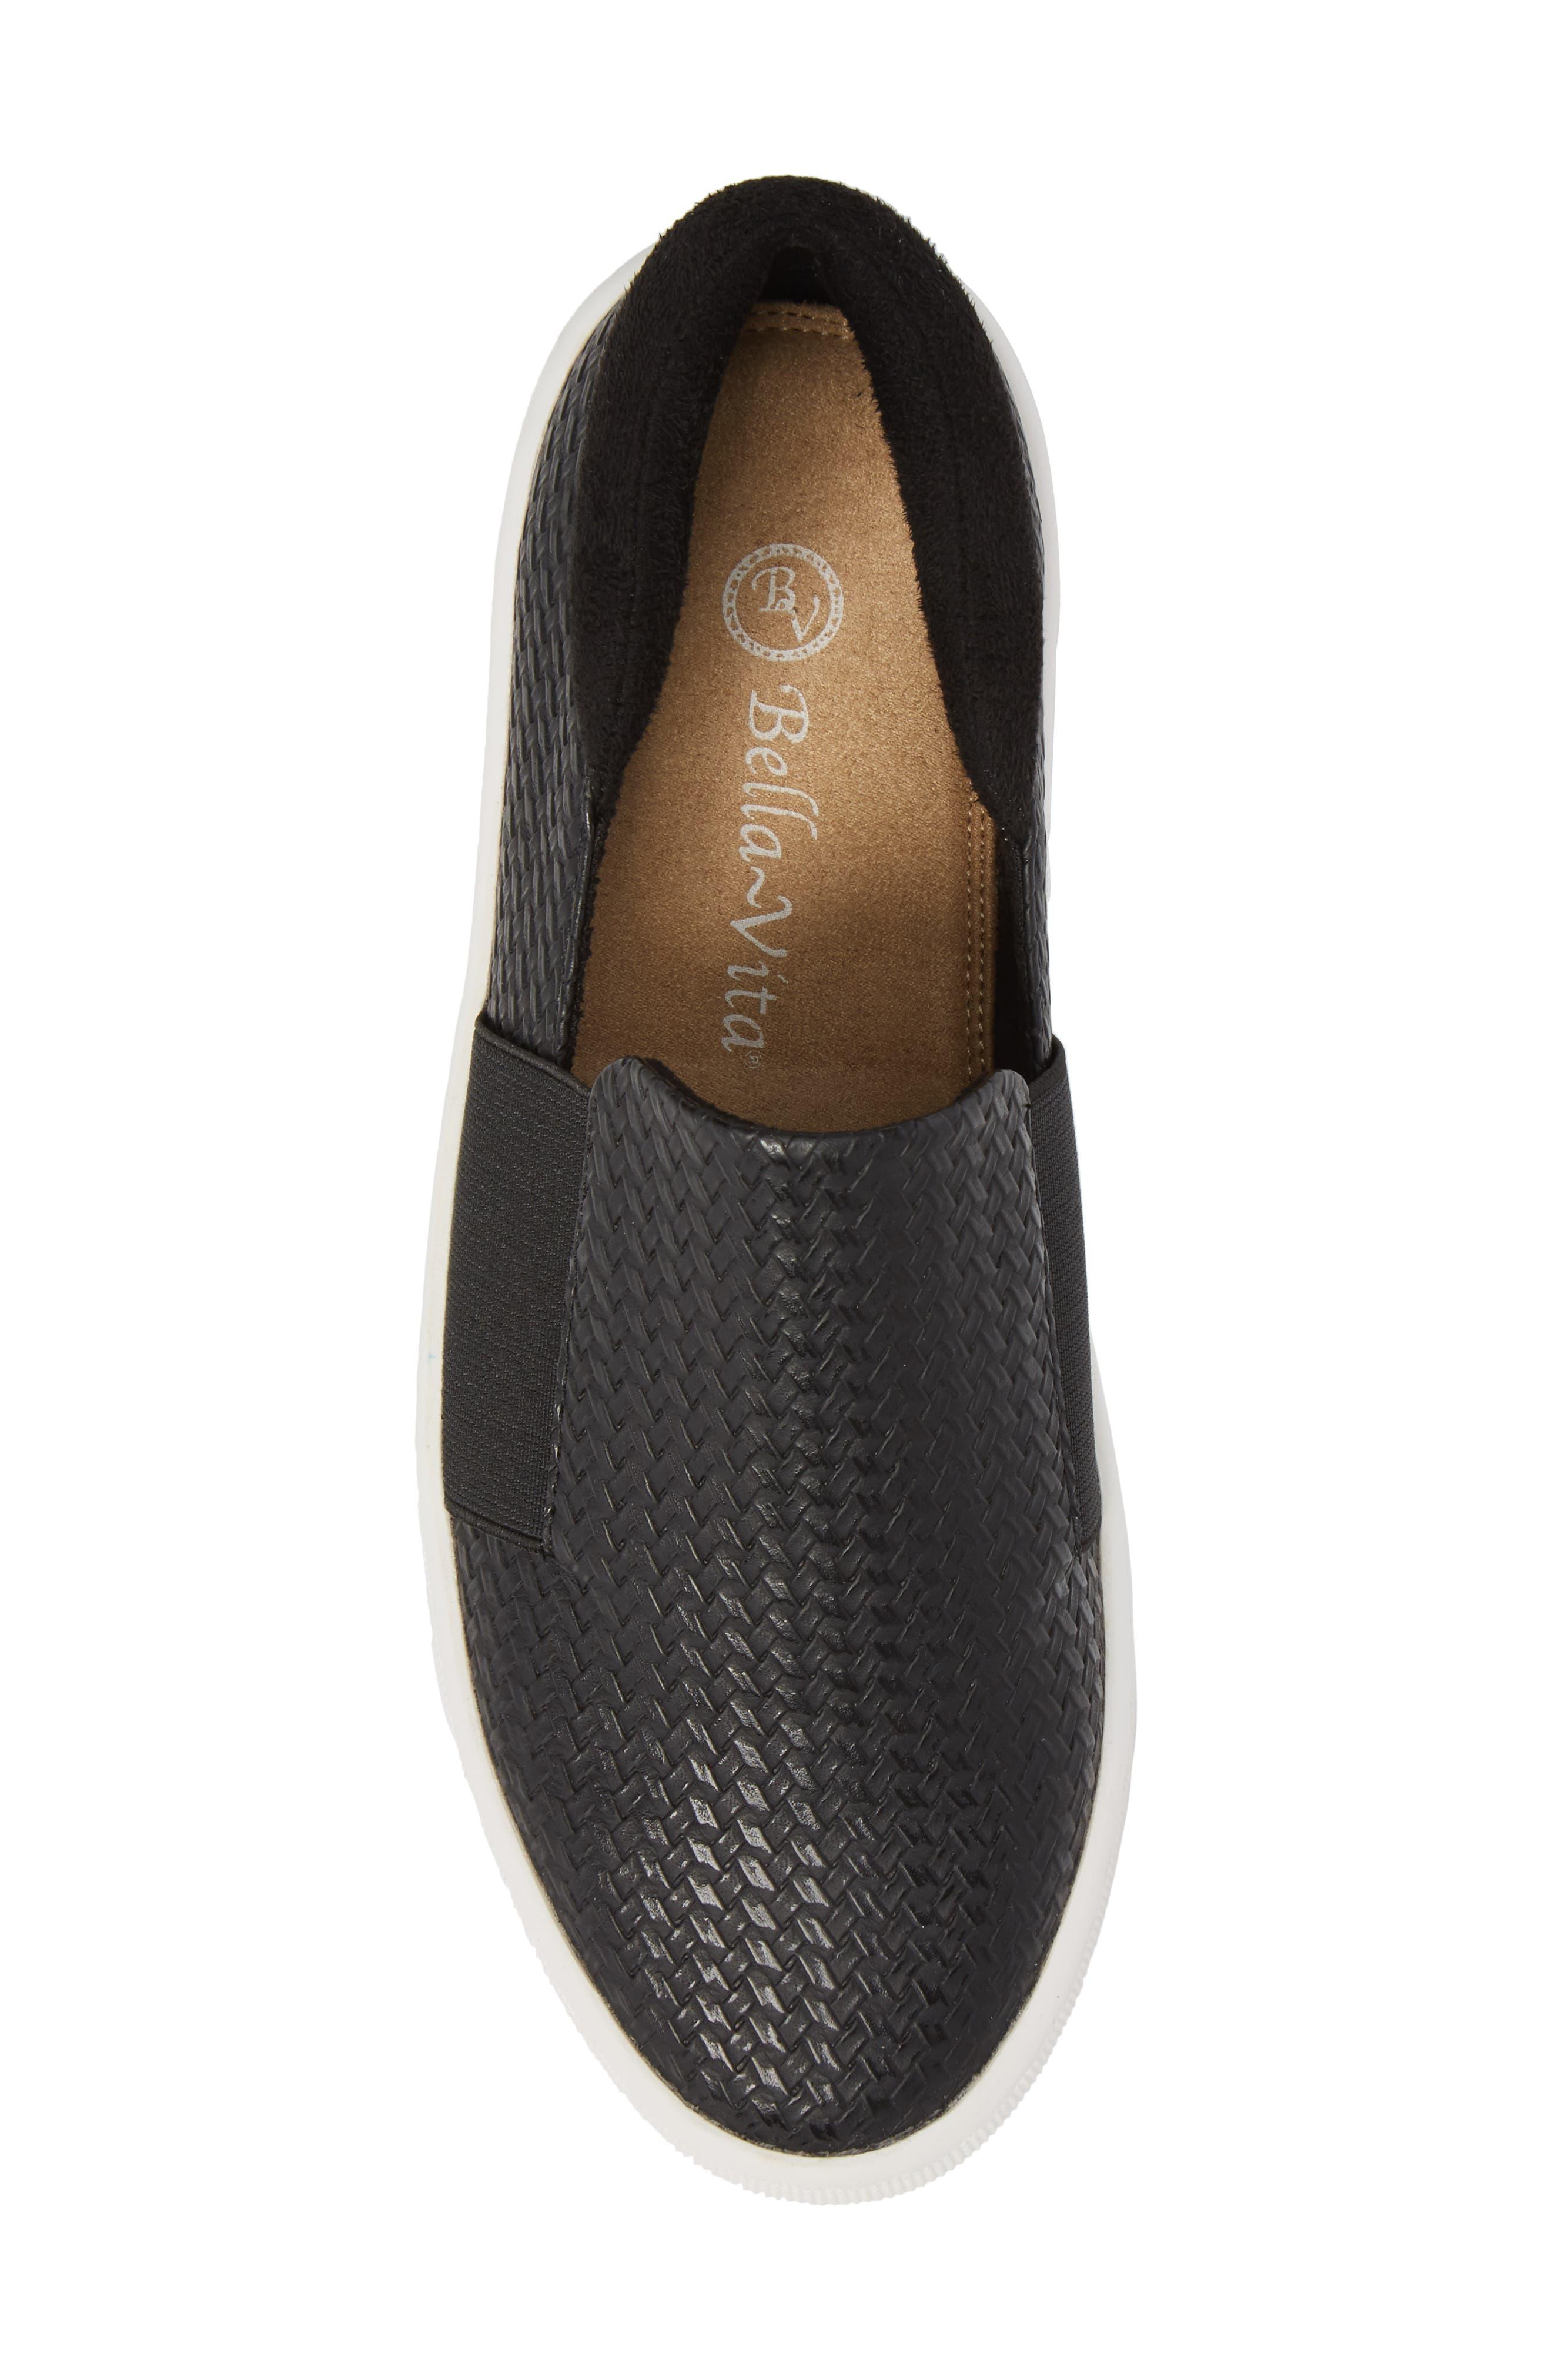 BELLA VITA, Ramp II Slip-On Sneaker, Alternate thumbnail 5, color, BLACK FABRIC